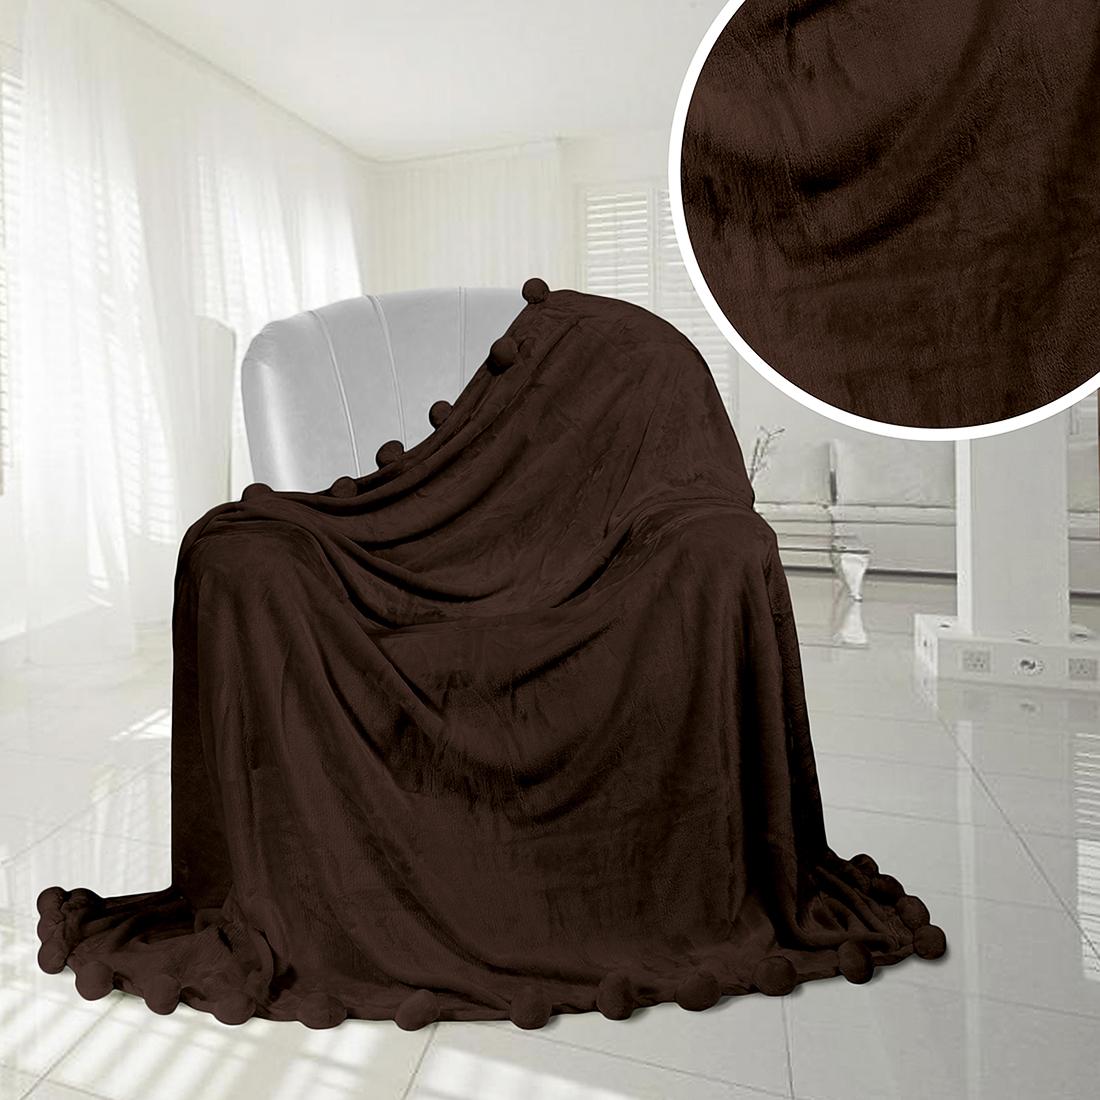 Плед Eleganta Плед Помпон Цвет: Шоколадный (210х220 см) плед eleganta плед помпон цвет фиолетовый 210х220 см